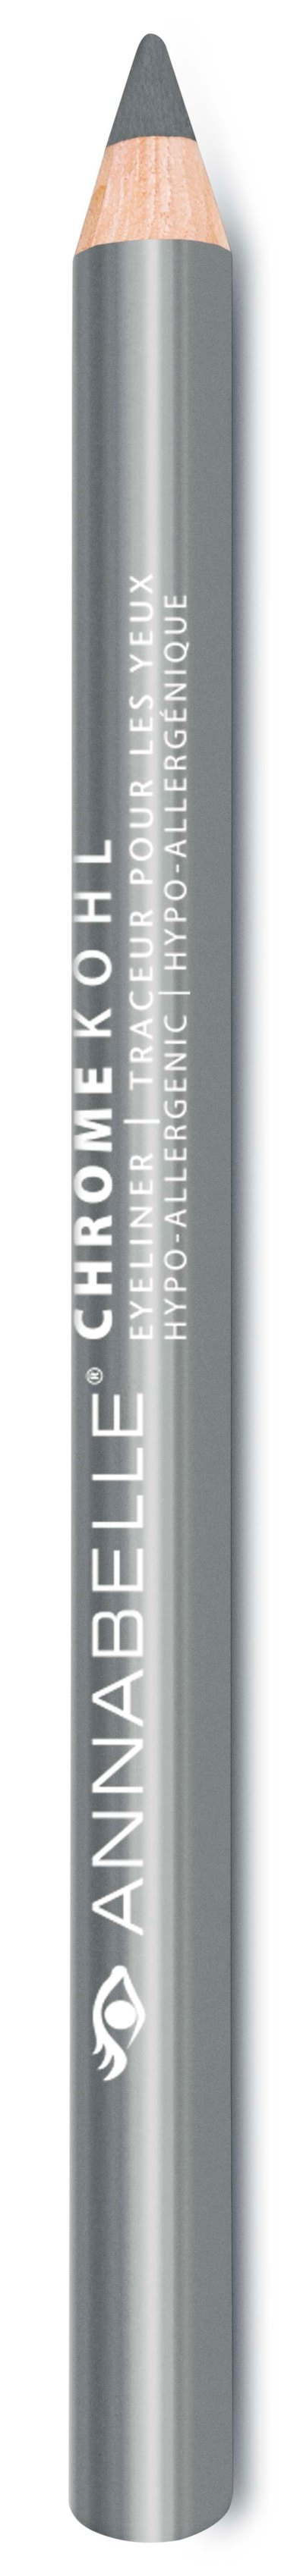 CHROME KOHL - Shocking Charcoal